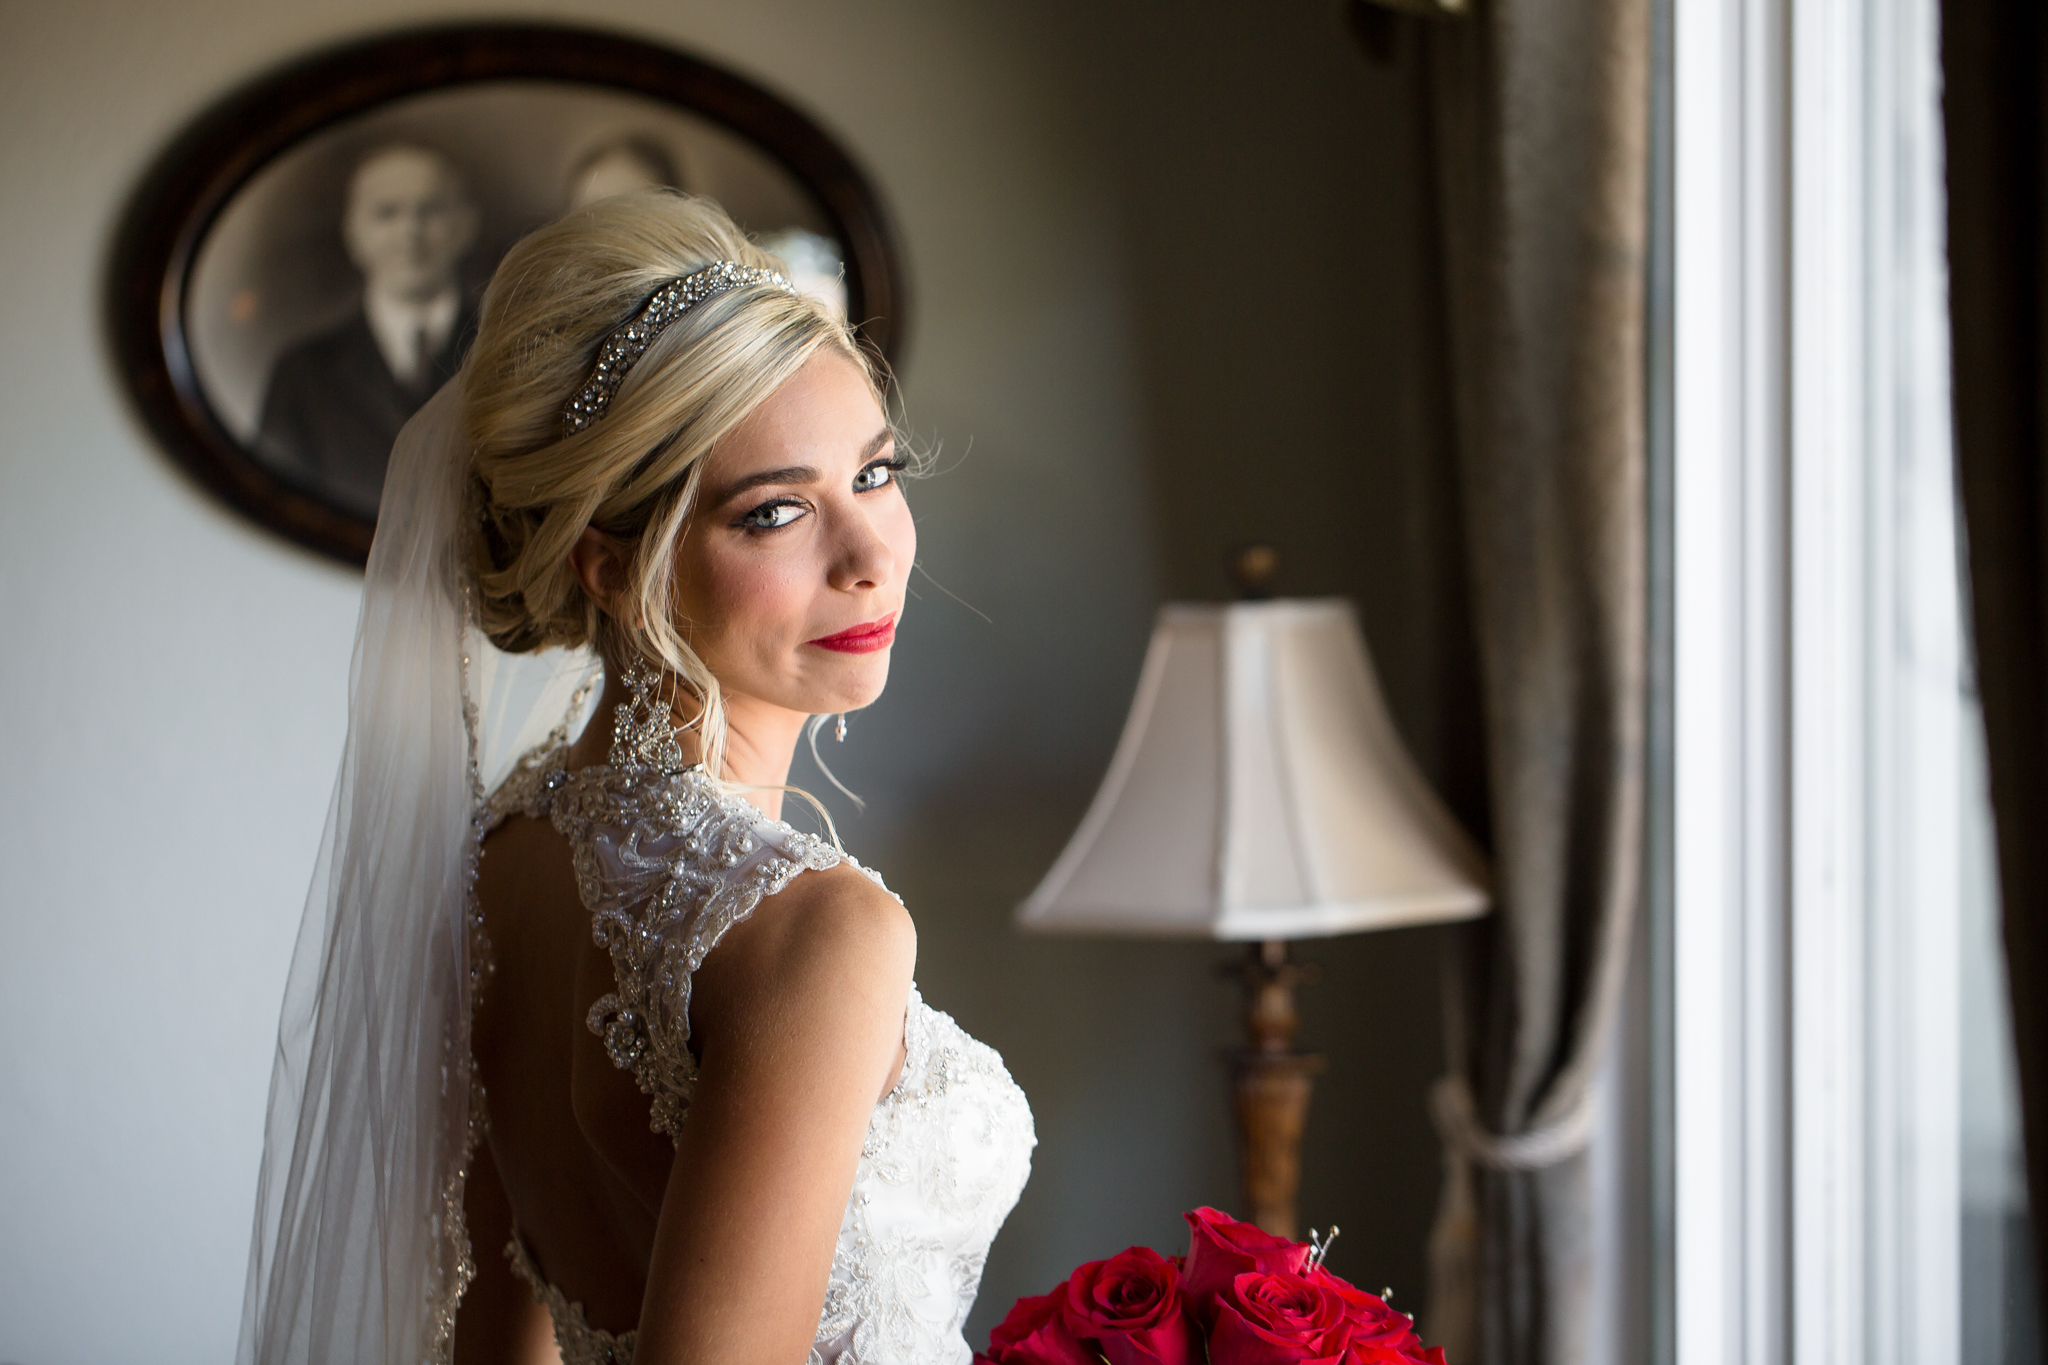 Statler-City-Buffalo-wedding-photographer- 0105.jpg